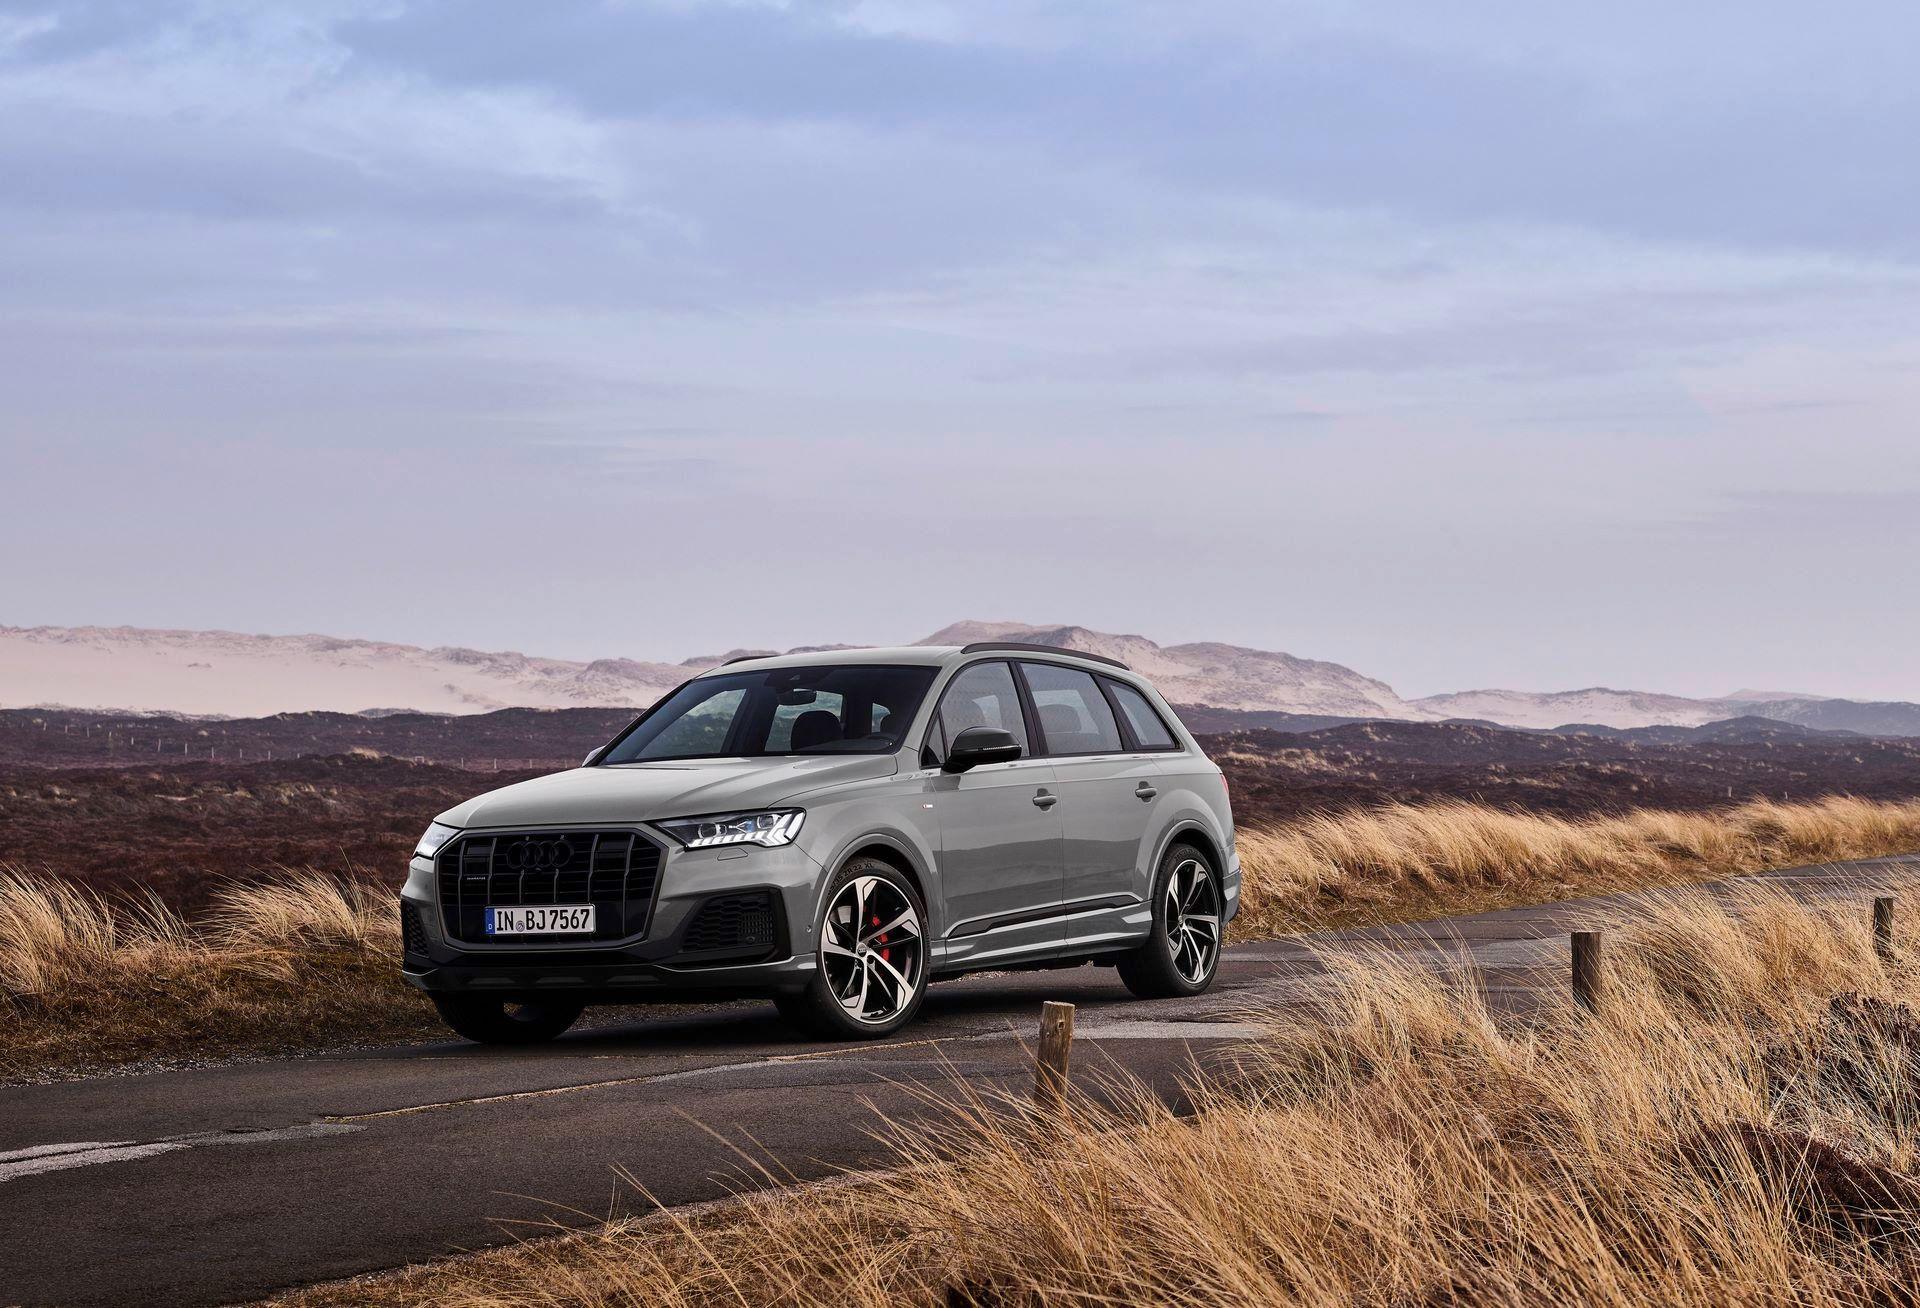 Audi-A4-A5-Q7-Q8-Competition-And-Competition-Plus-Trims-39